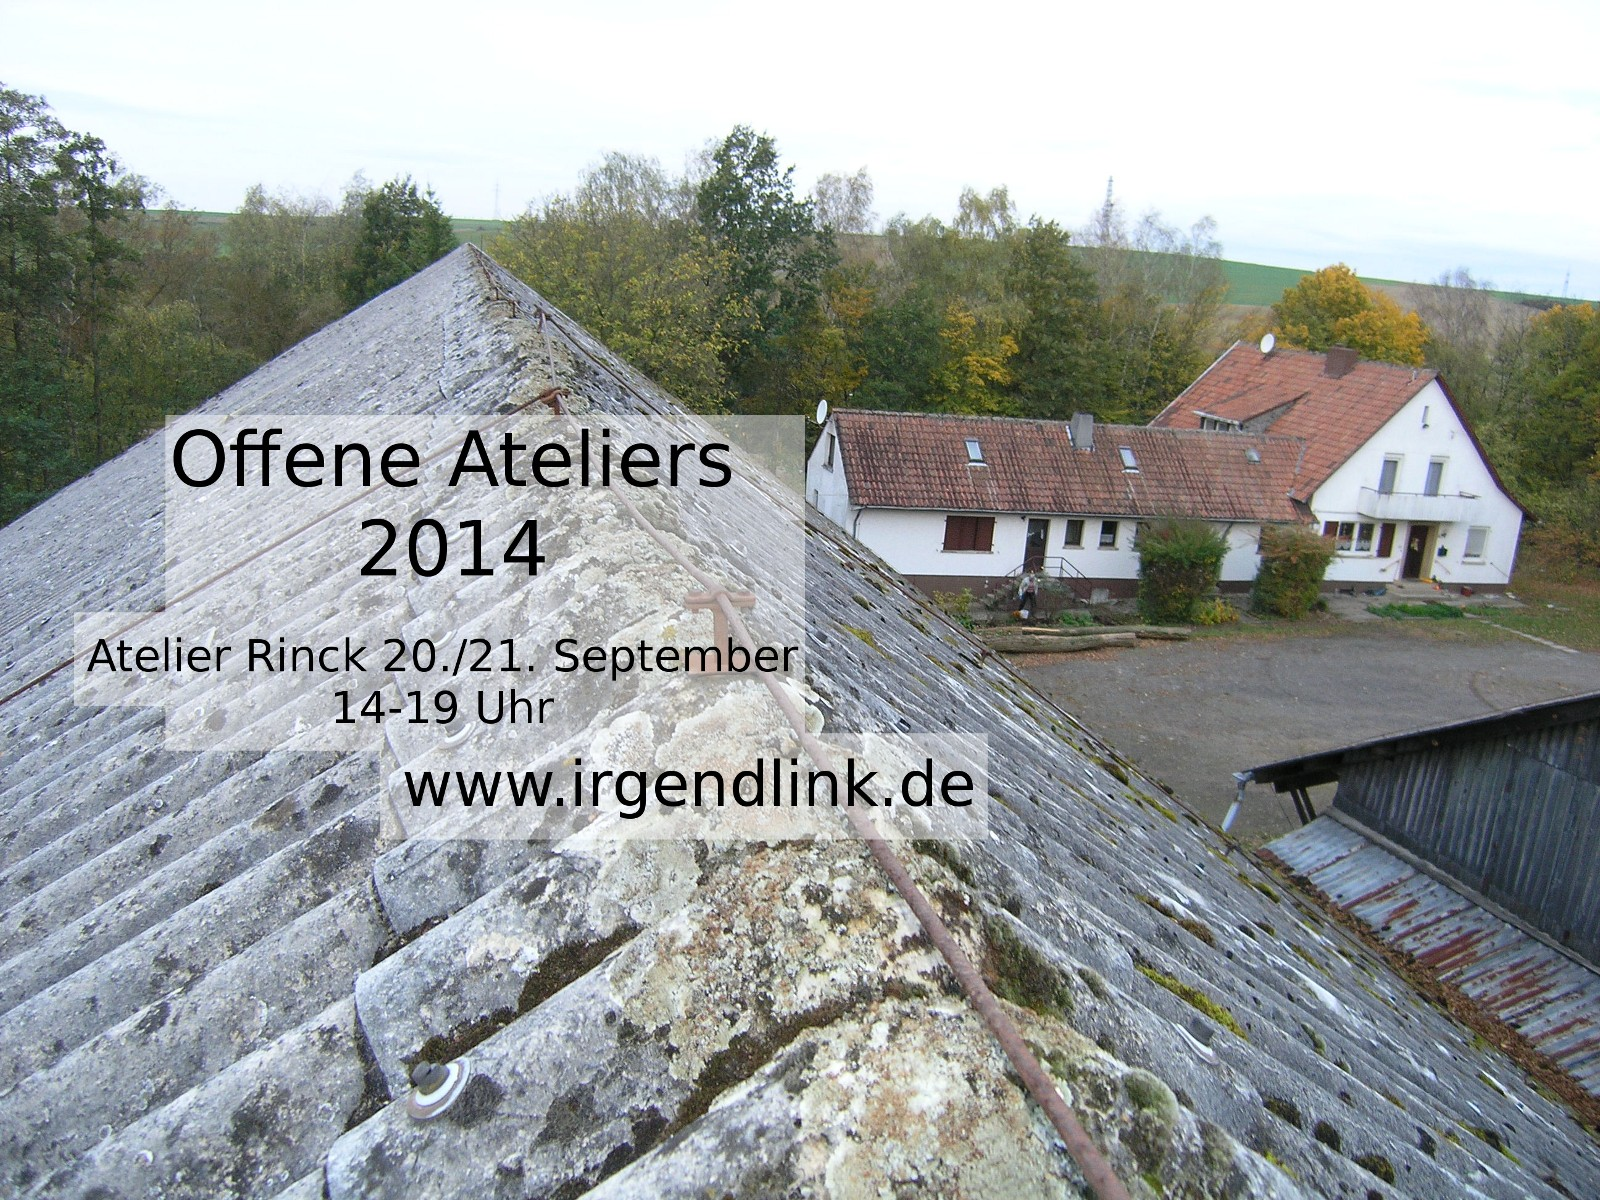 Offene Ateliers Rinckenhof 2014